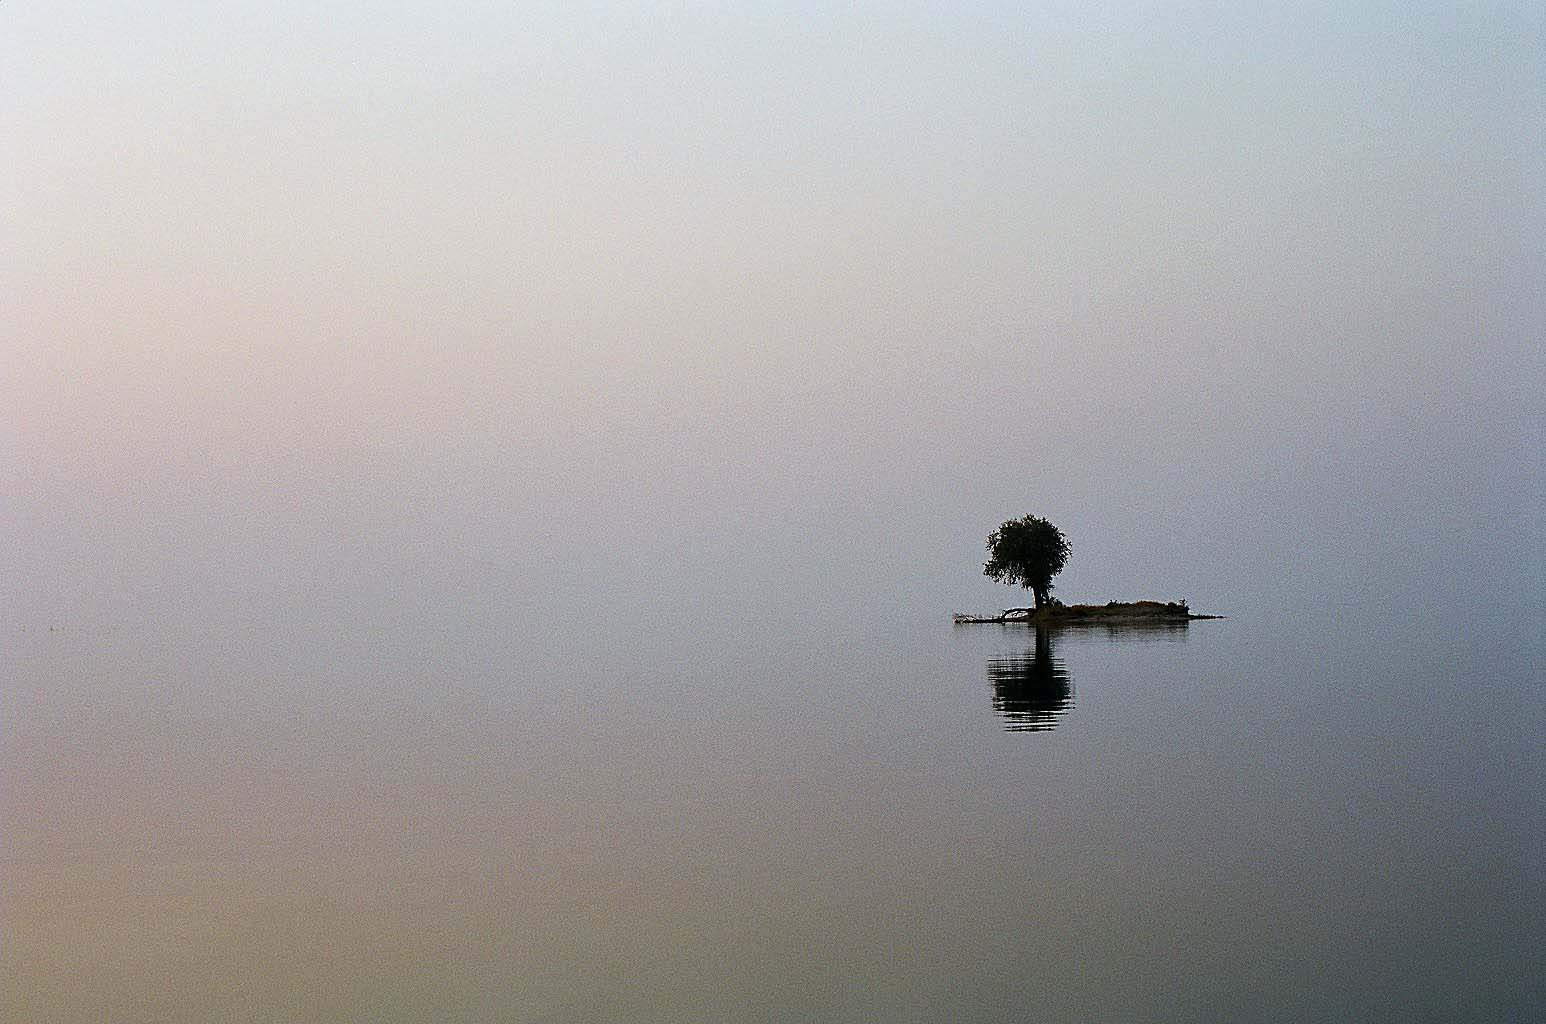 Lake Kariba, Zimbabwe, 08.2009, 35mm